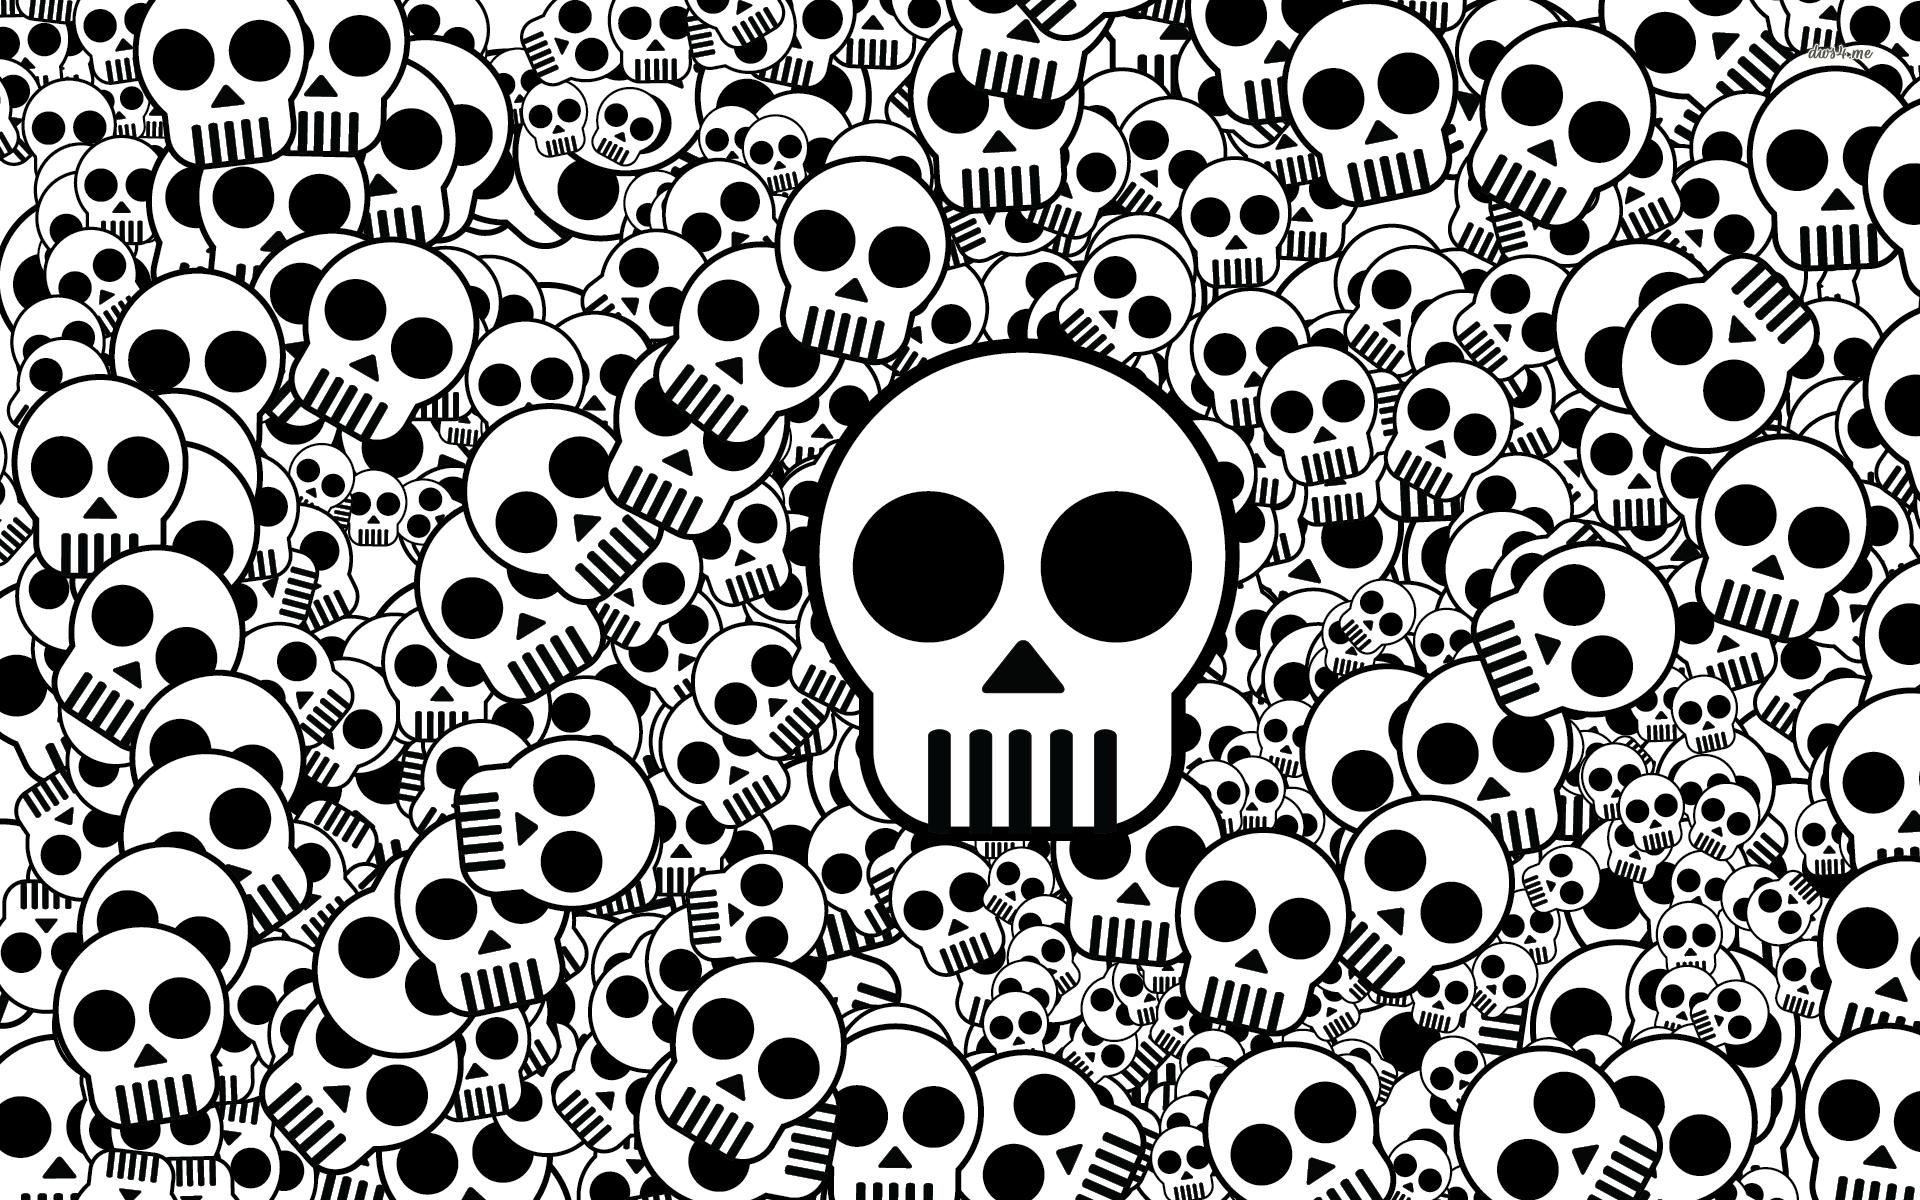 Skulls wallpaper 34231 1920x1200